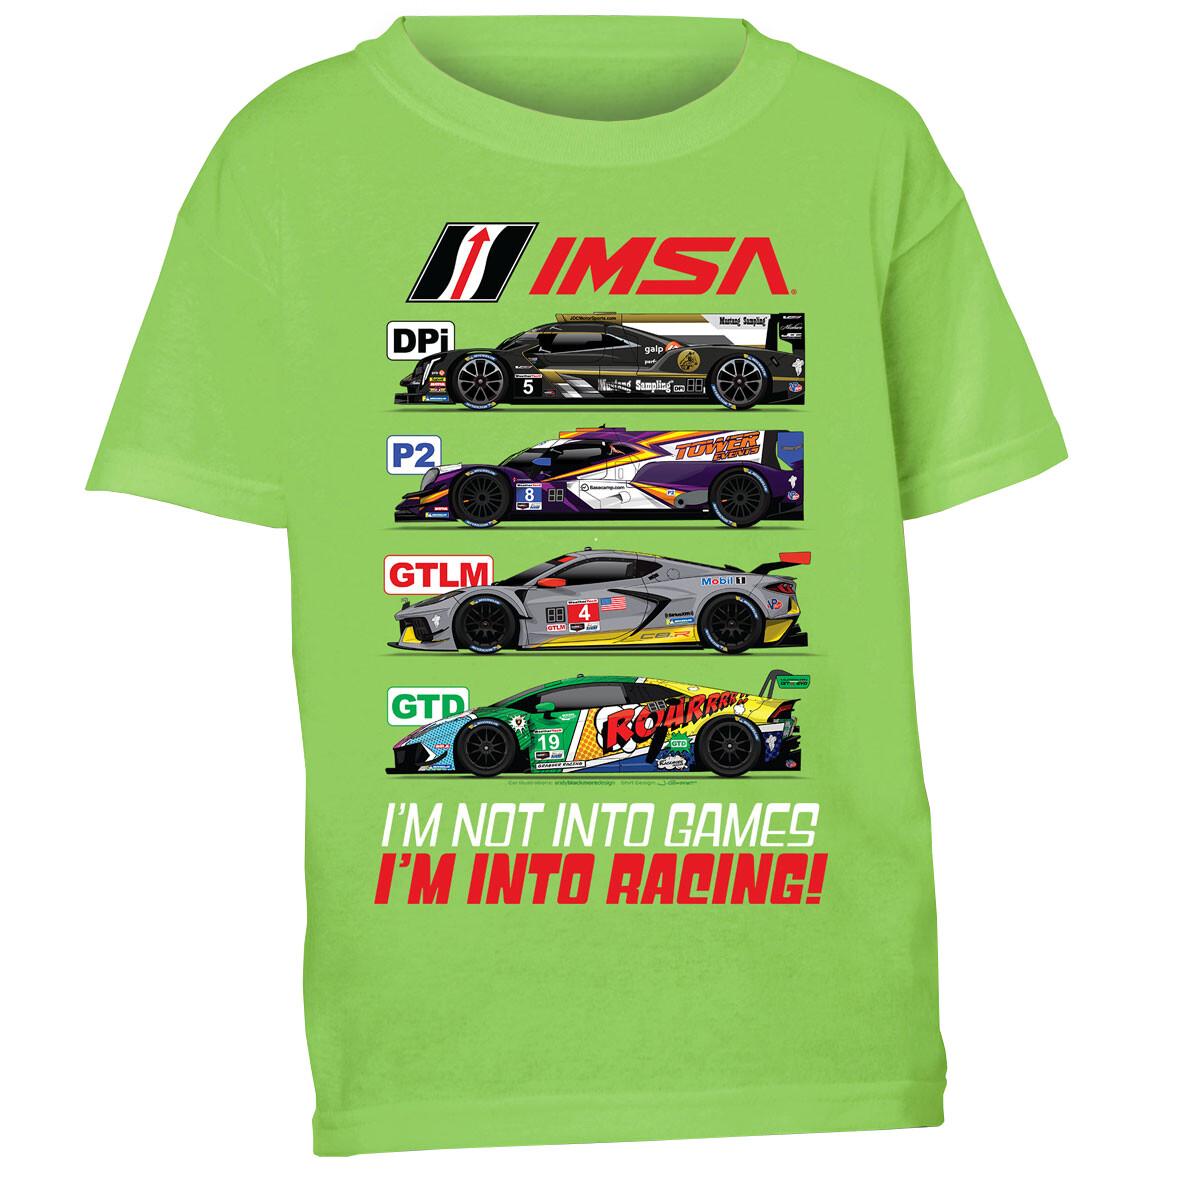 IMSA Youth Class T Lime